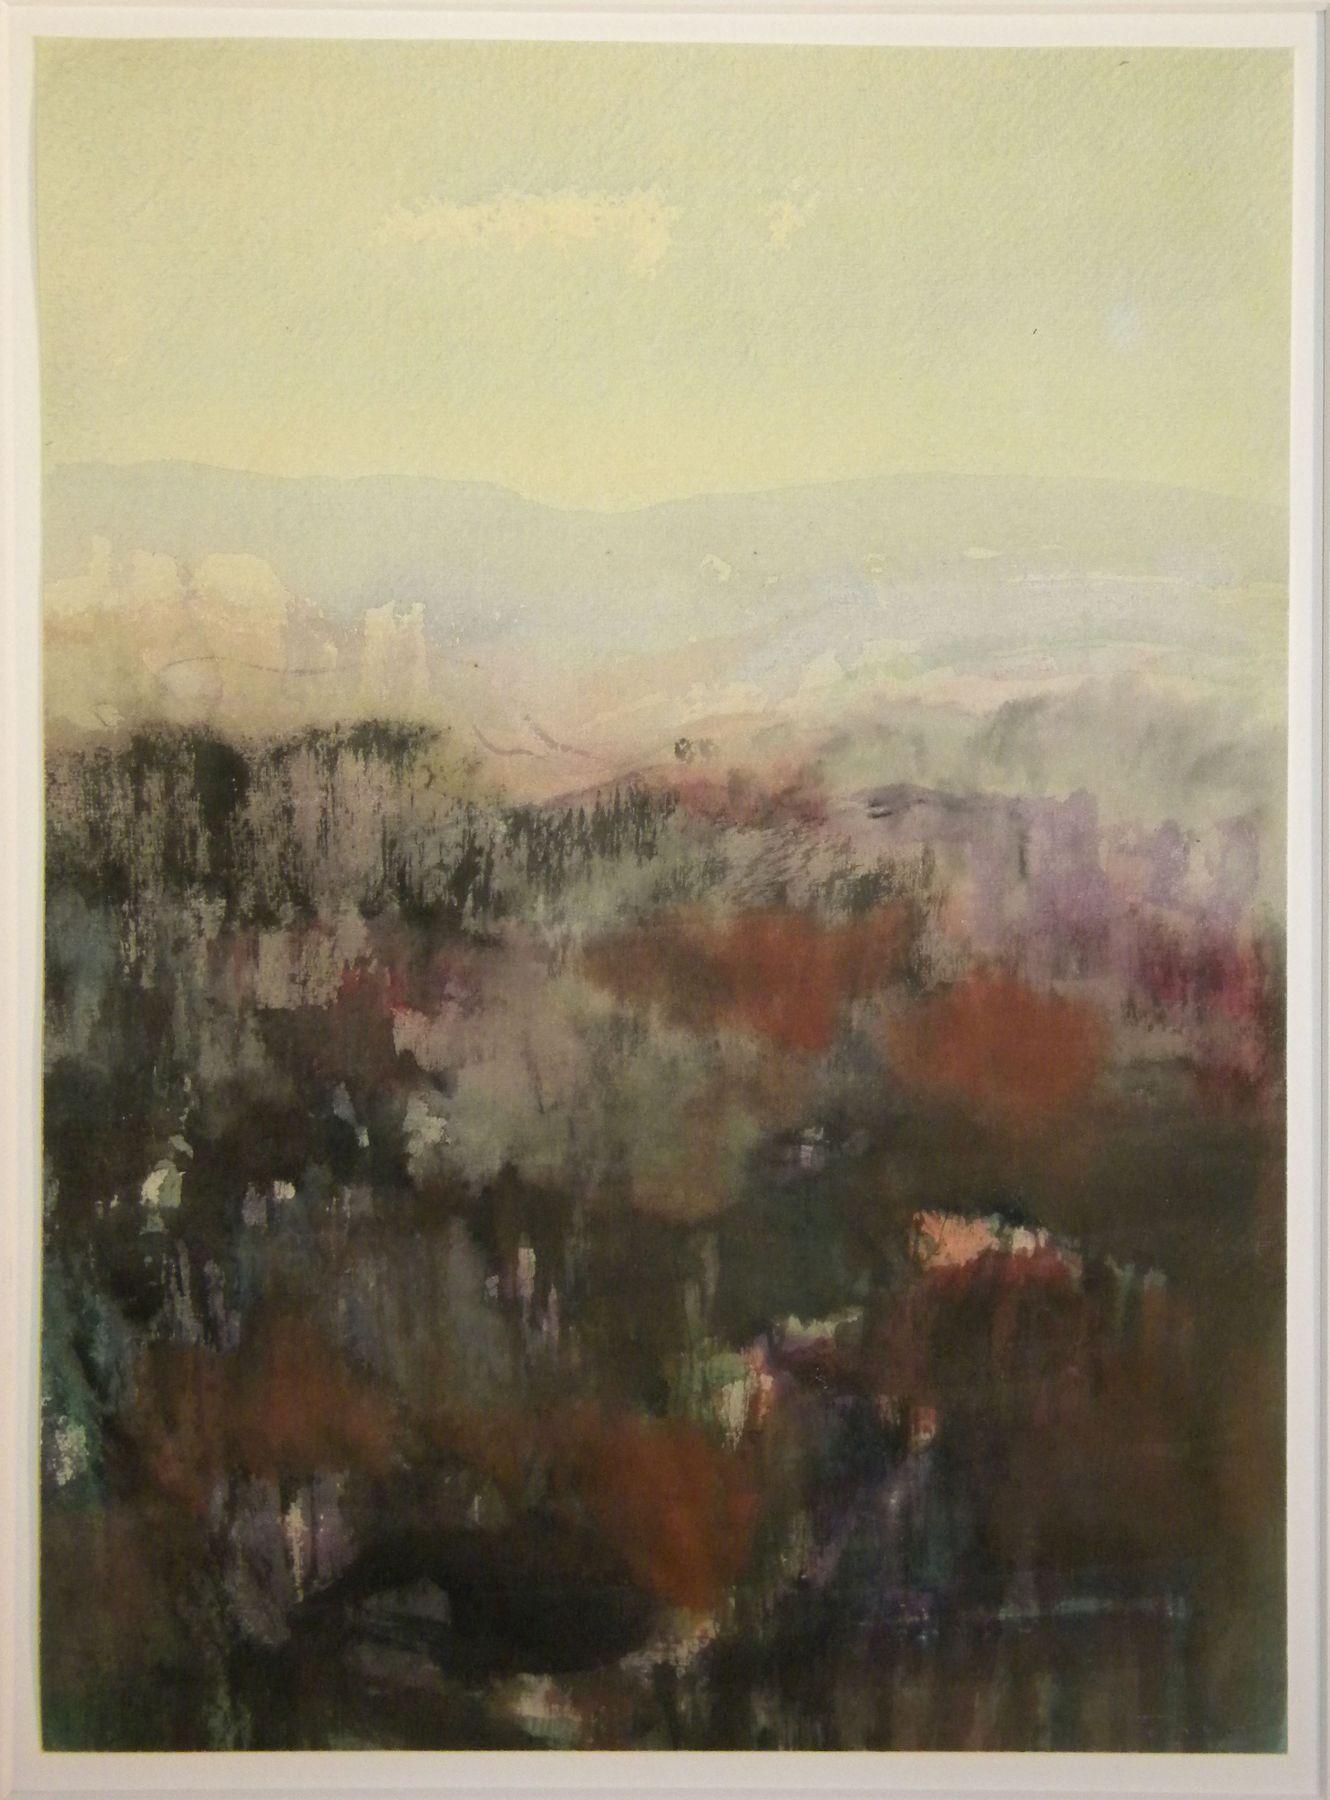 Fulvio Testa  Untitled, 2008  Watercolor on paper  13 1/2 x 9 1/4 inches (34.2 x 24.8 cm)